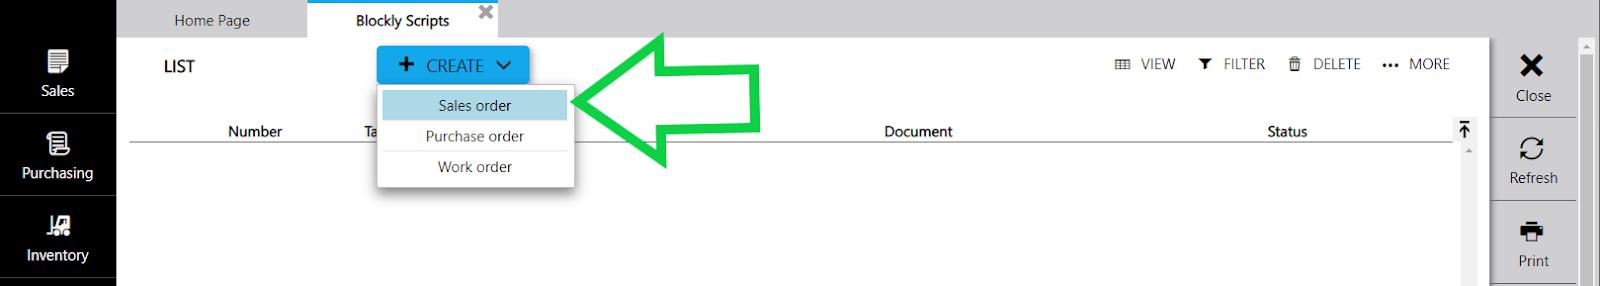 create blockly script